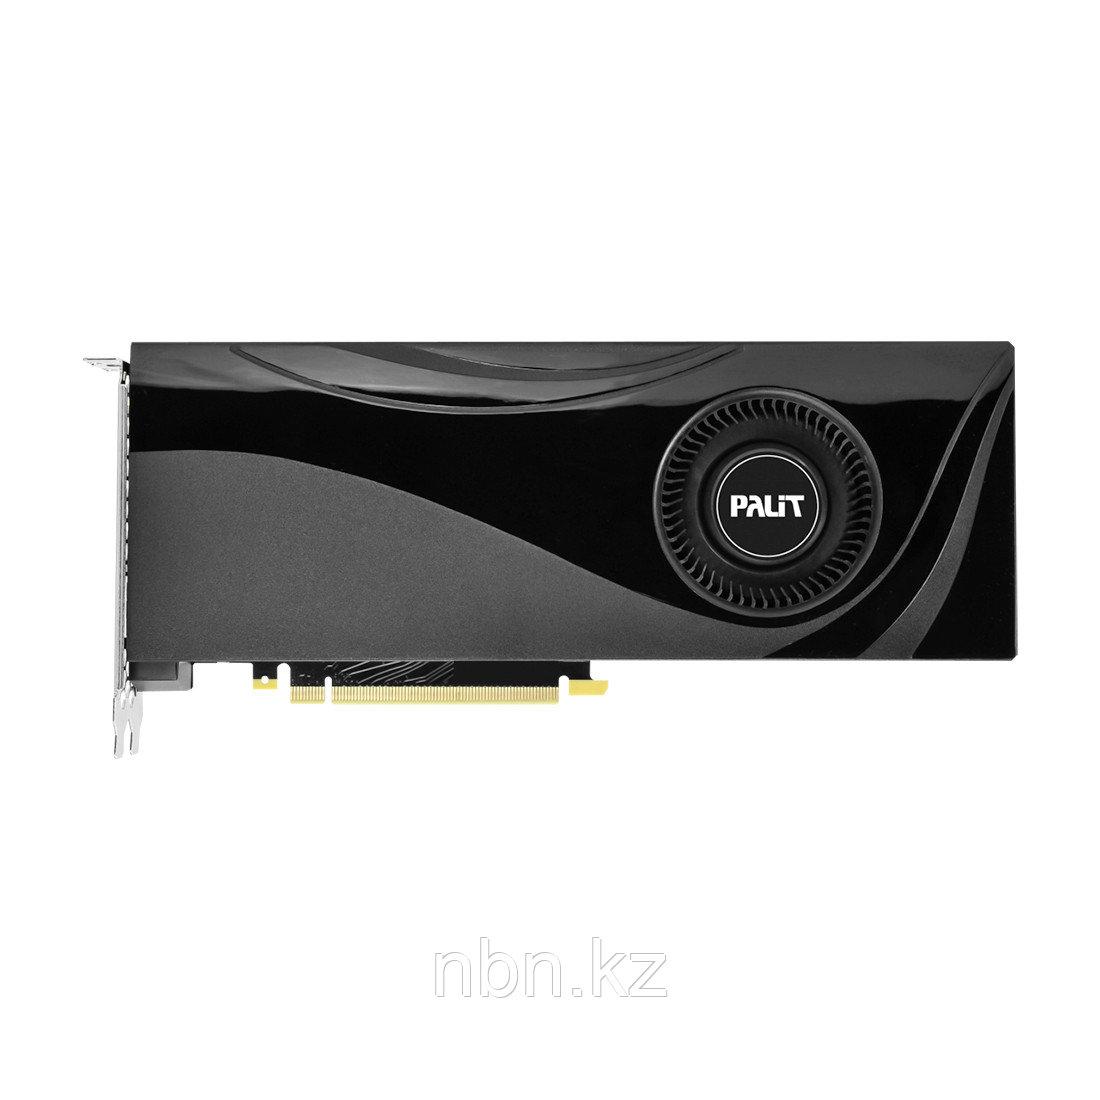 Видеокарта PALIT RTX2070 SUPER X 8G (NE6207S019P2-180F)